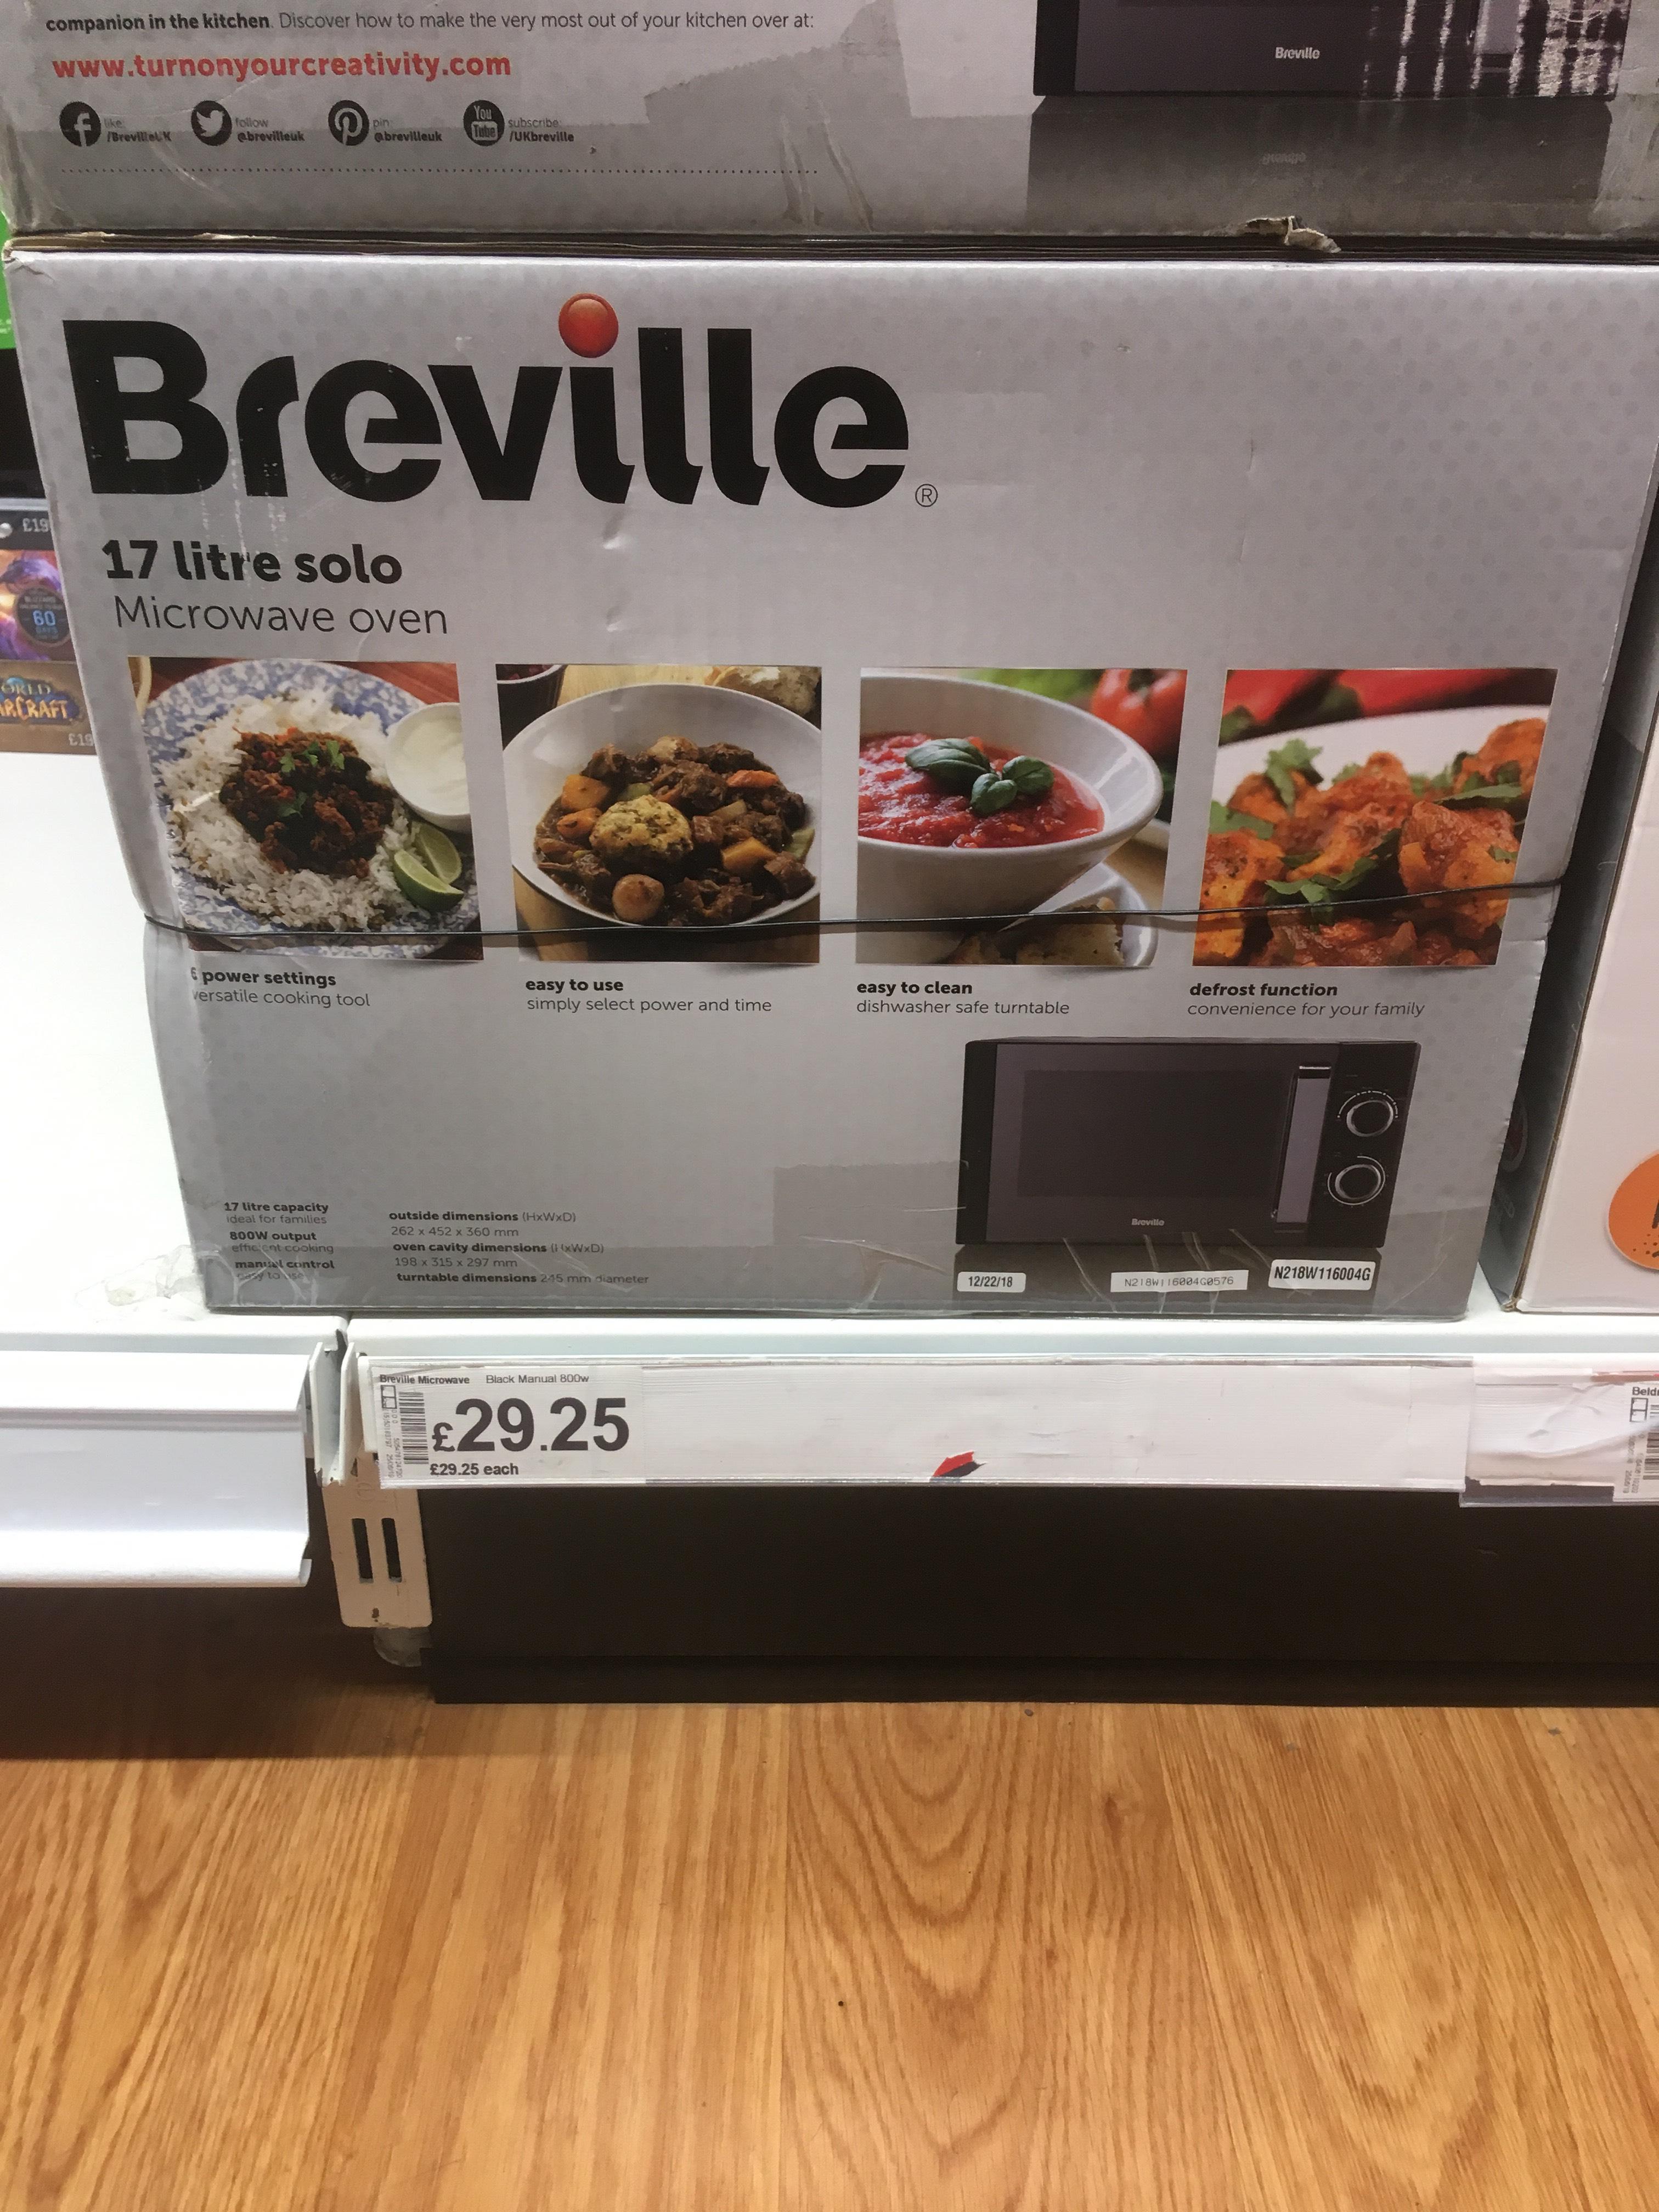 Breville 800w microwave @ Asda instore £29.95.